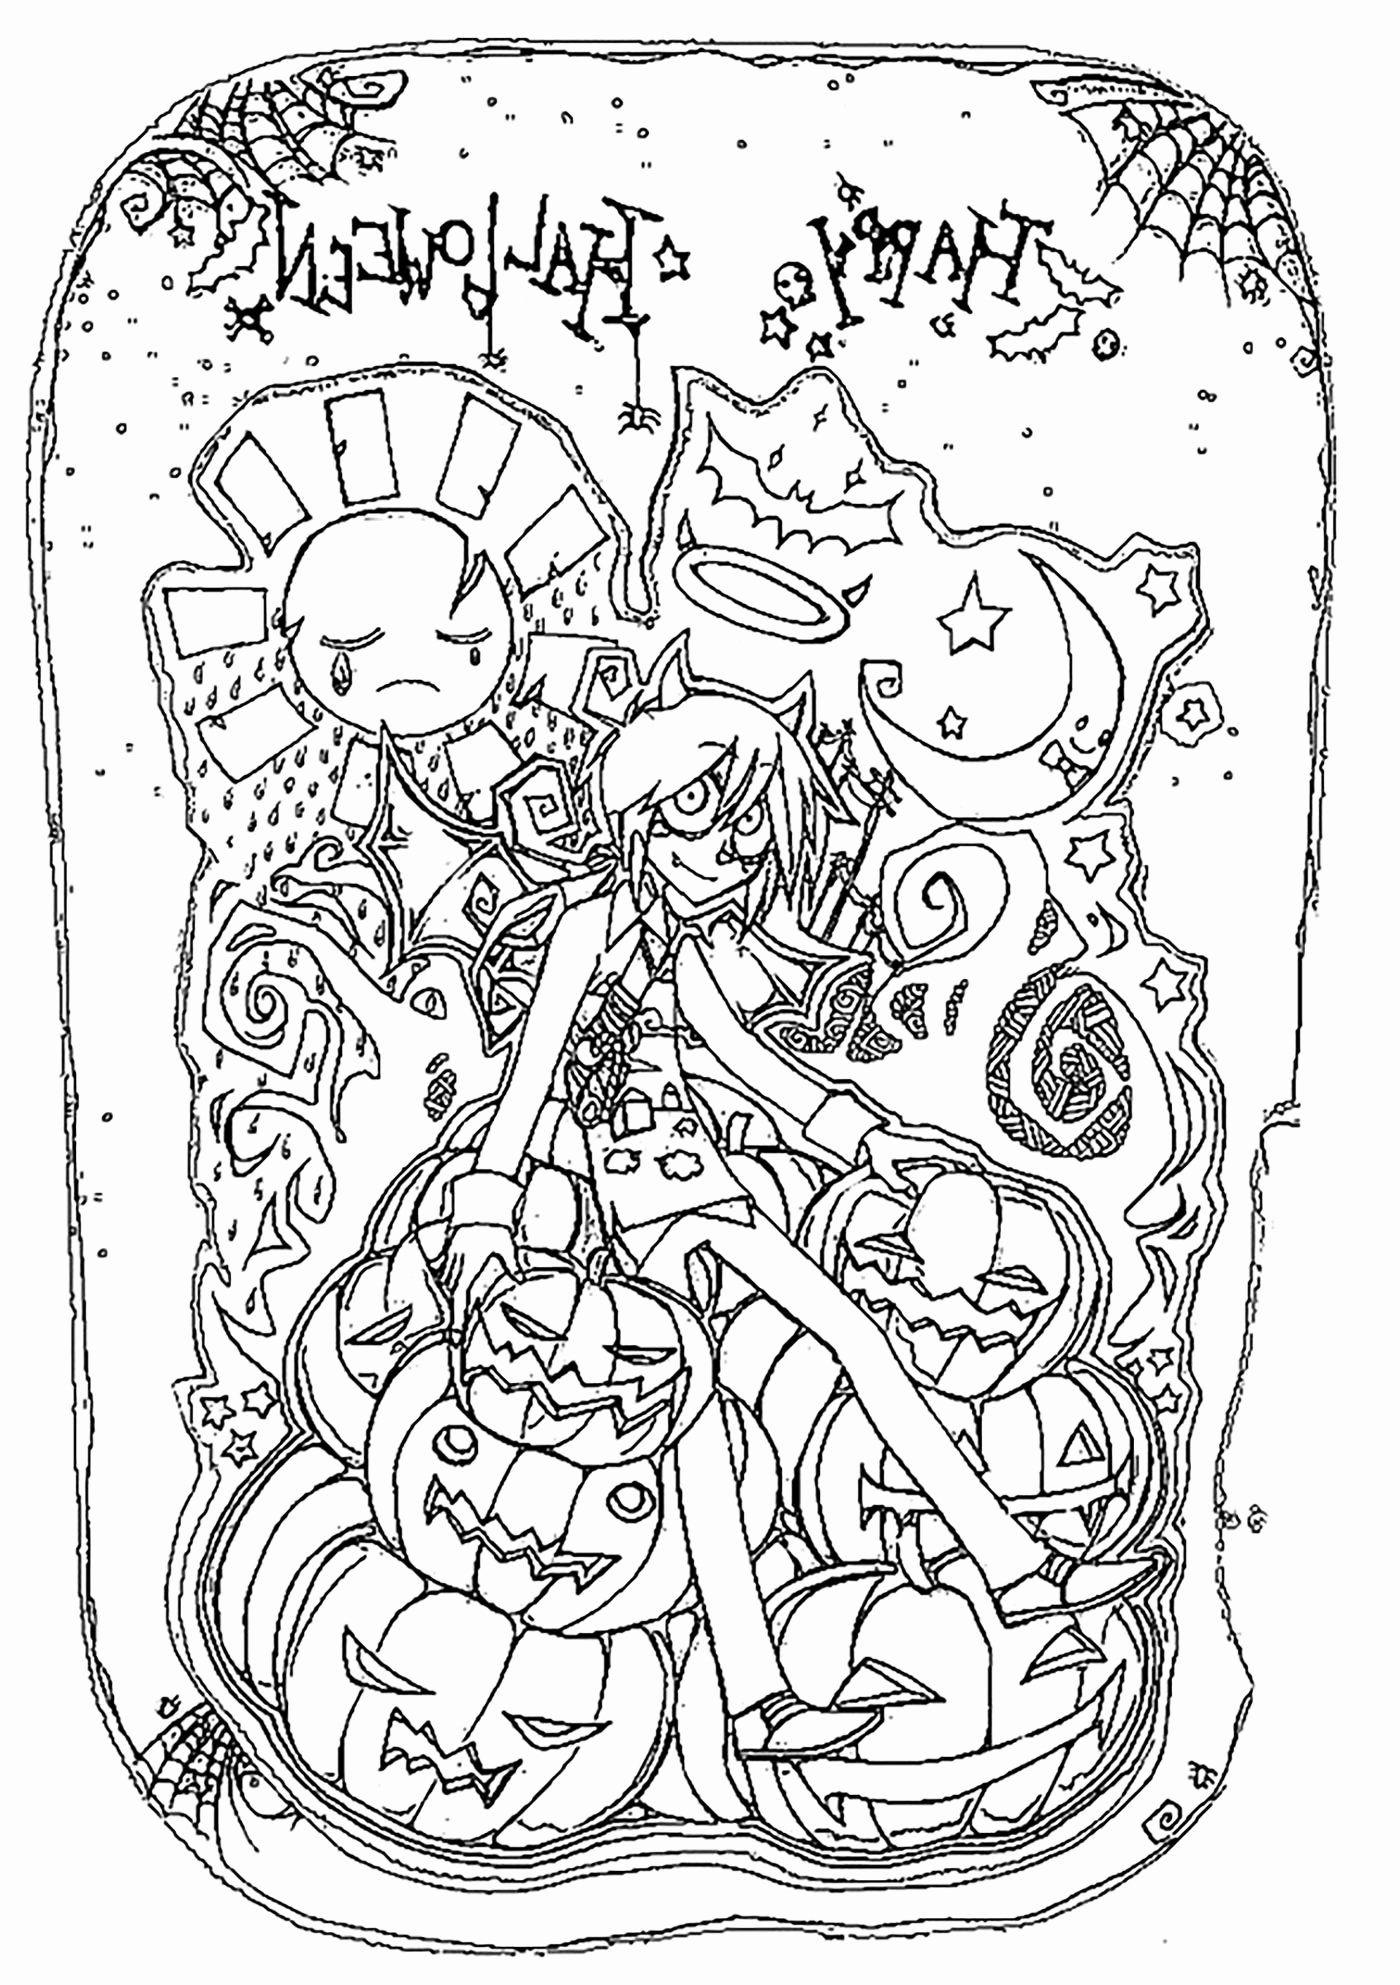 Halloween Frankenstein Coloring Pages (Dengan gambar)